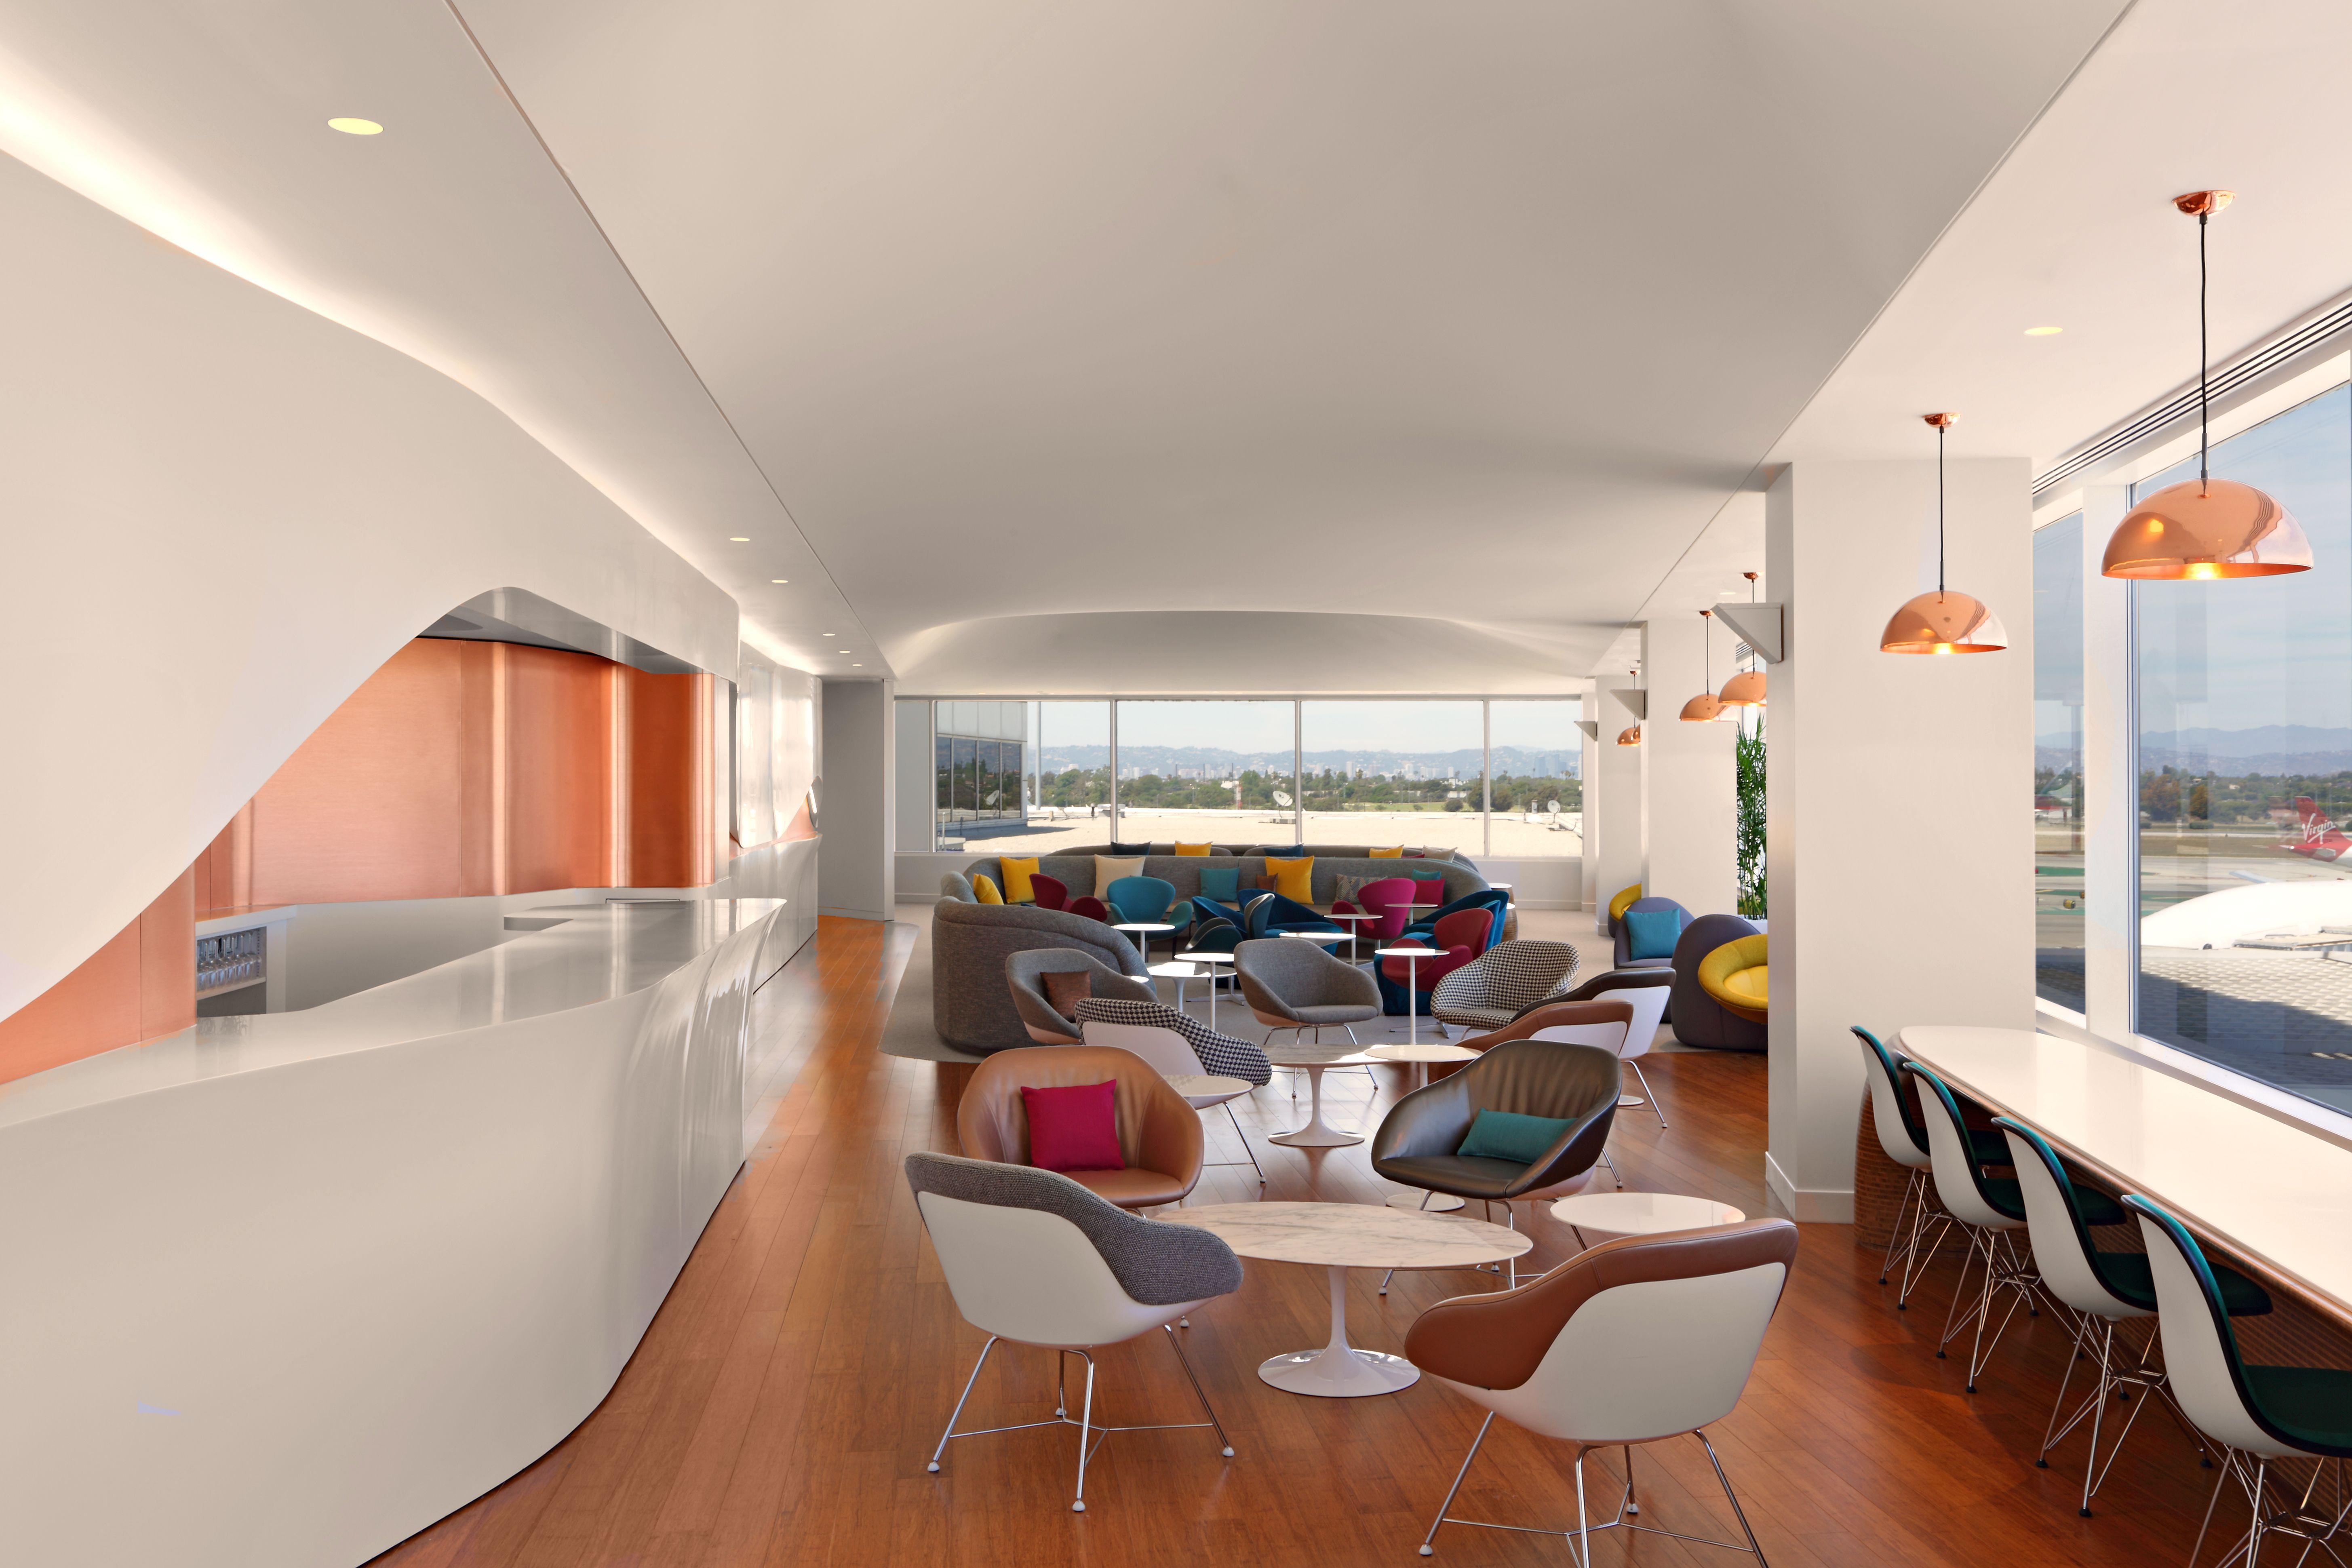 Kgm Architectural Lighting Virgin Atlantic Lax Clubhouse Lounge Virgin Atlantic Club House Lounge Design